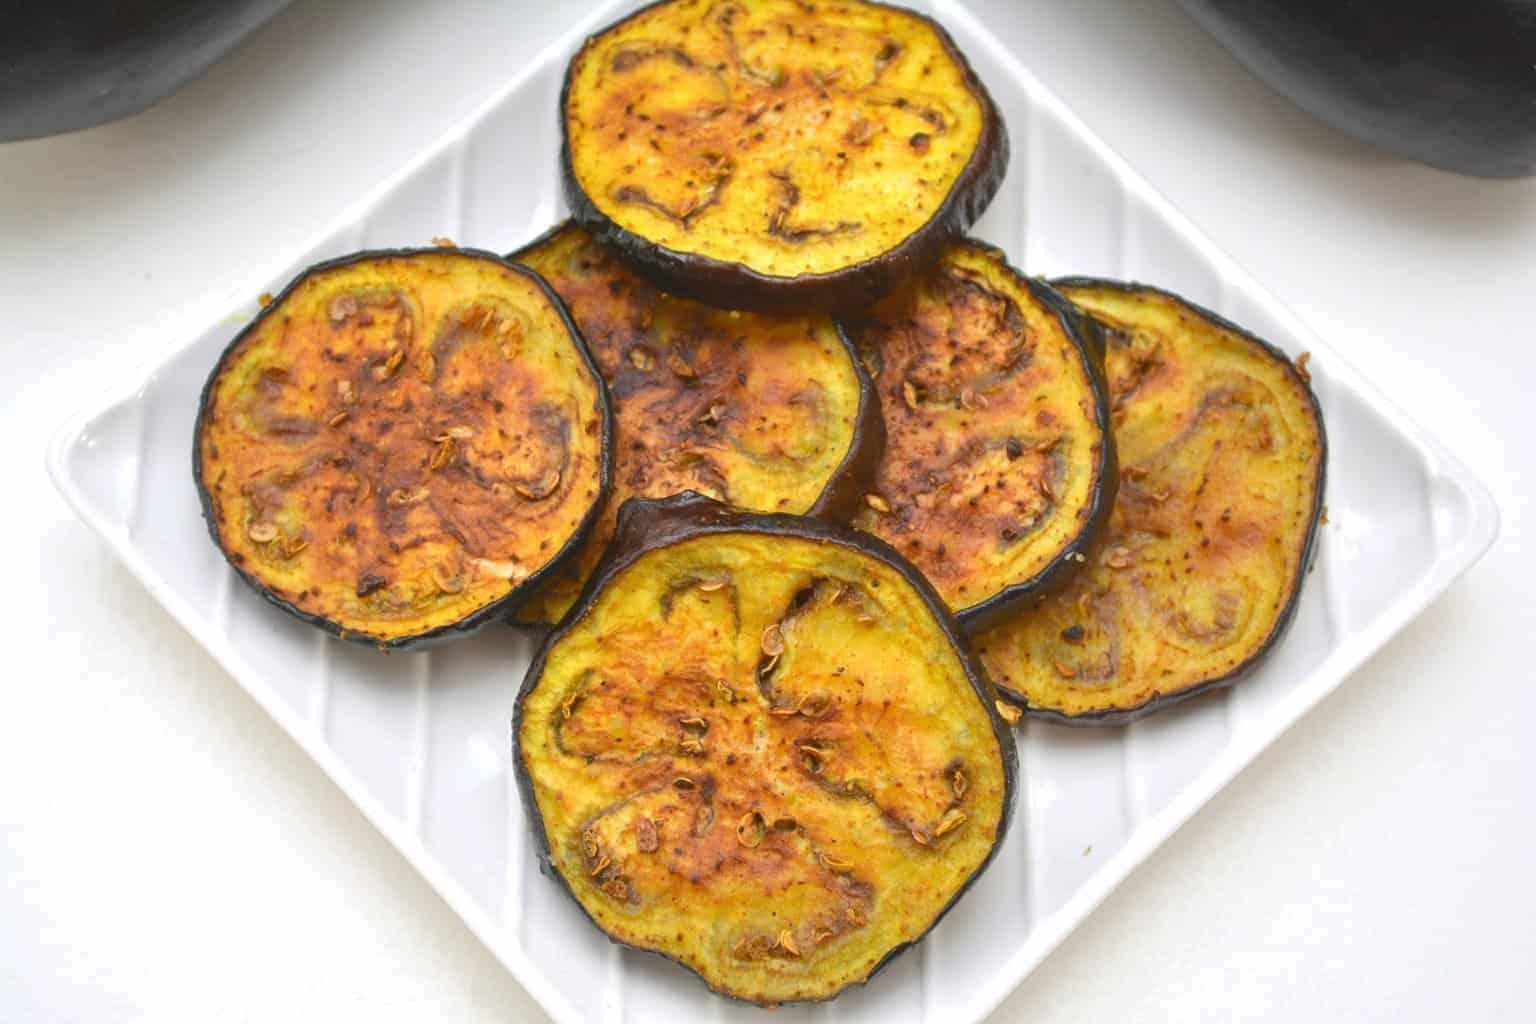 Curried Air Fryer Eggplant